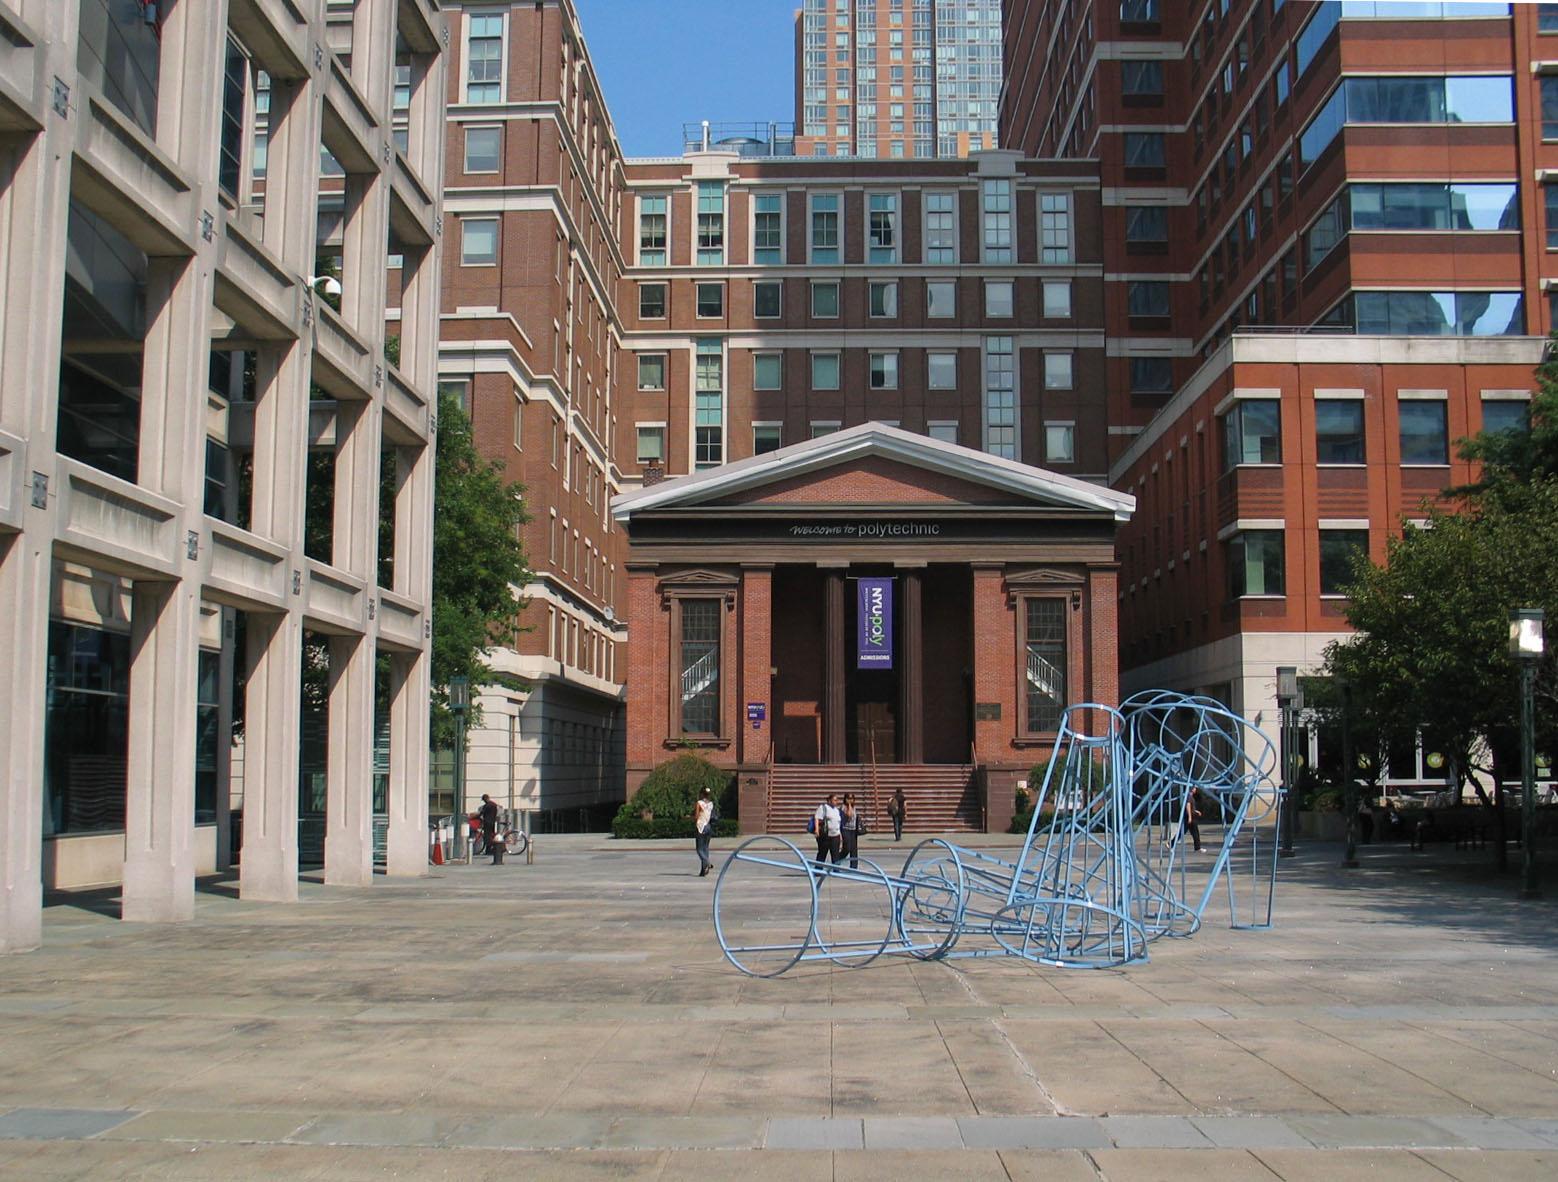 image of New York University Tandon School of Engineering